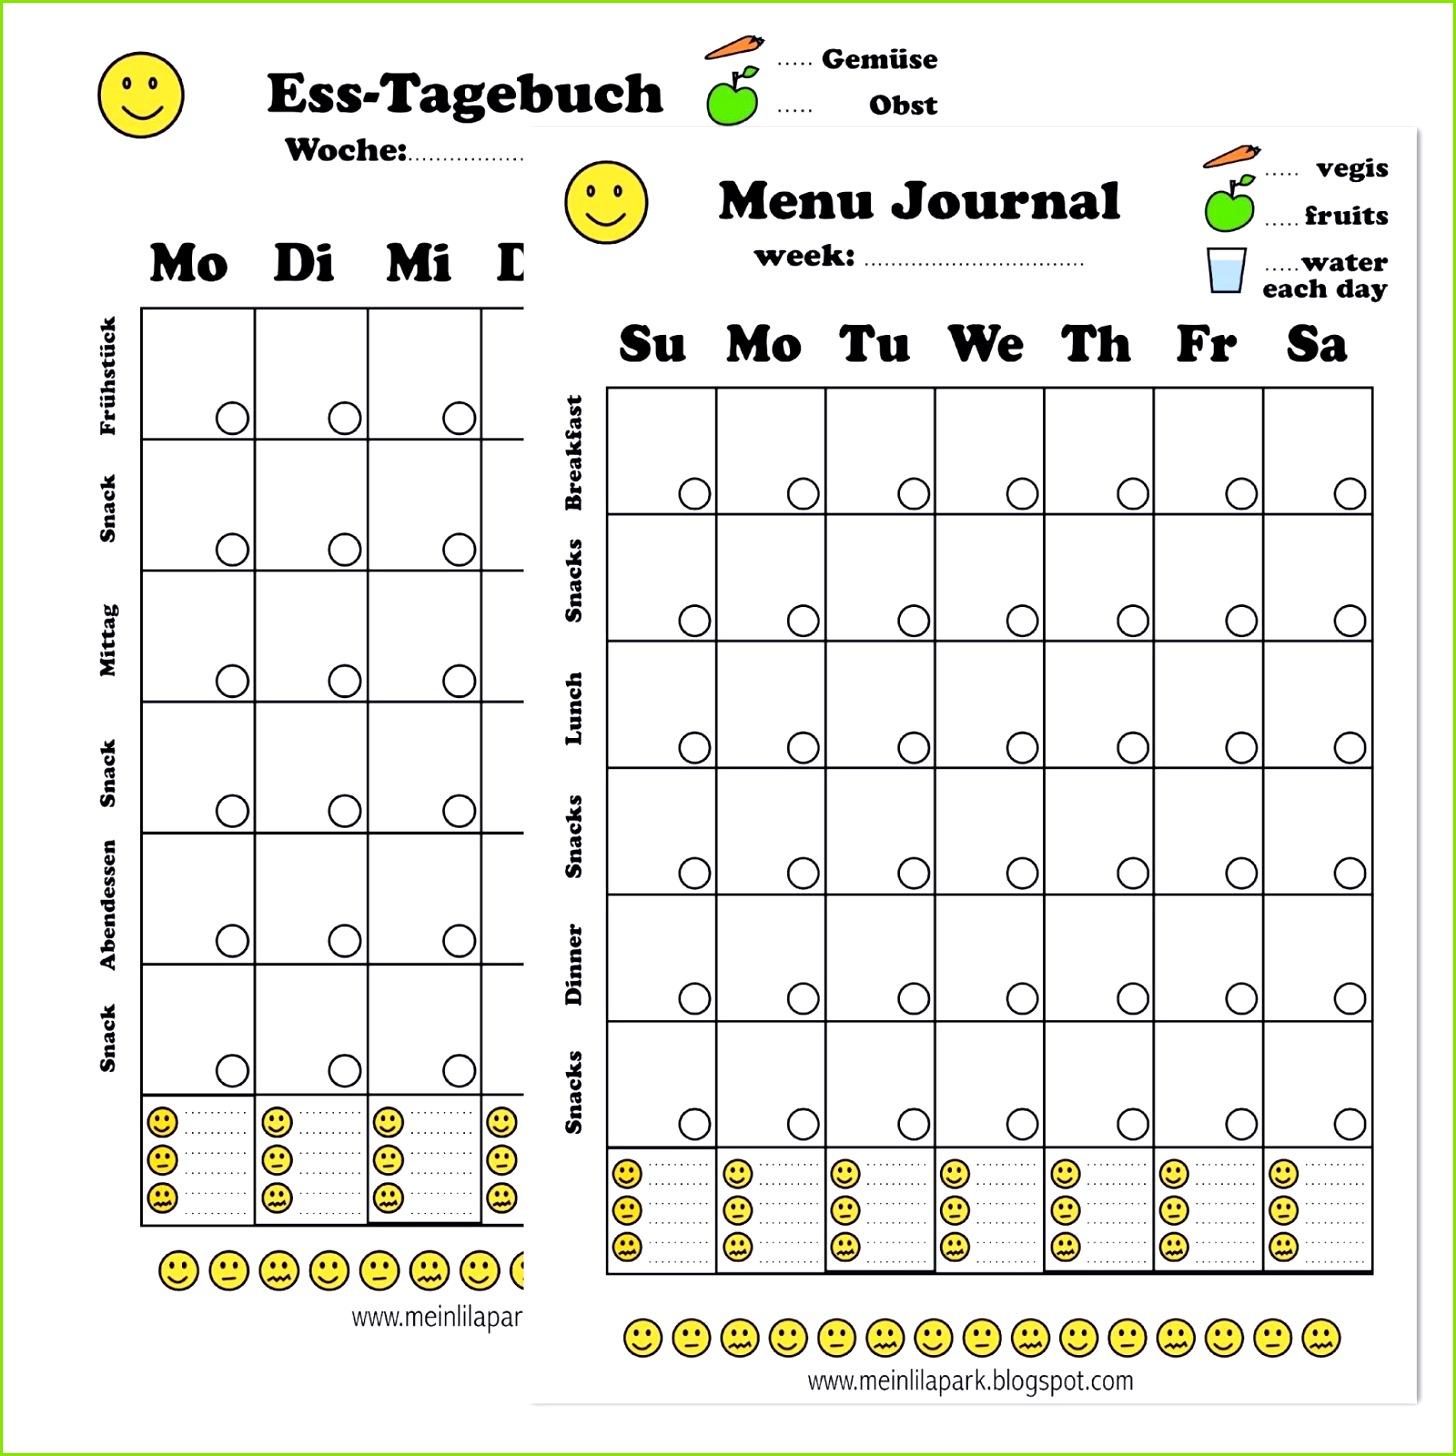 Free printable menu journal ausdruckbares Diät Tagebuch freebie